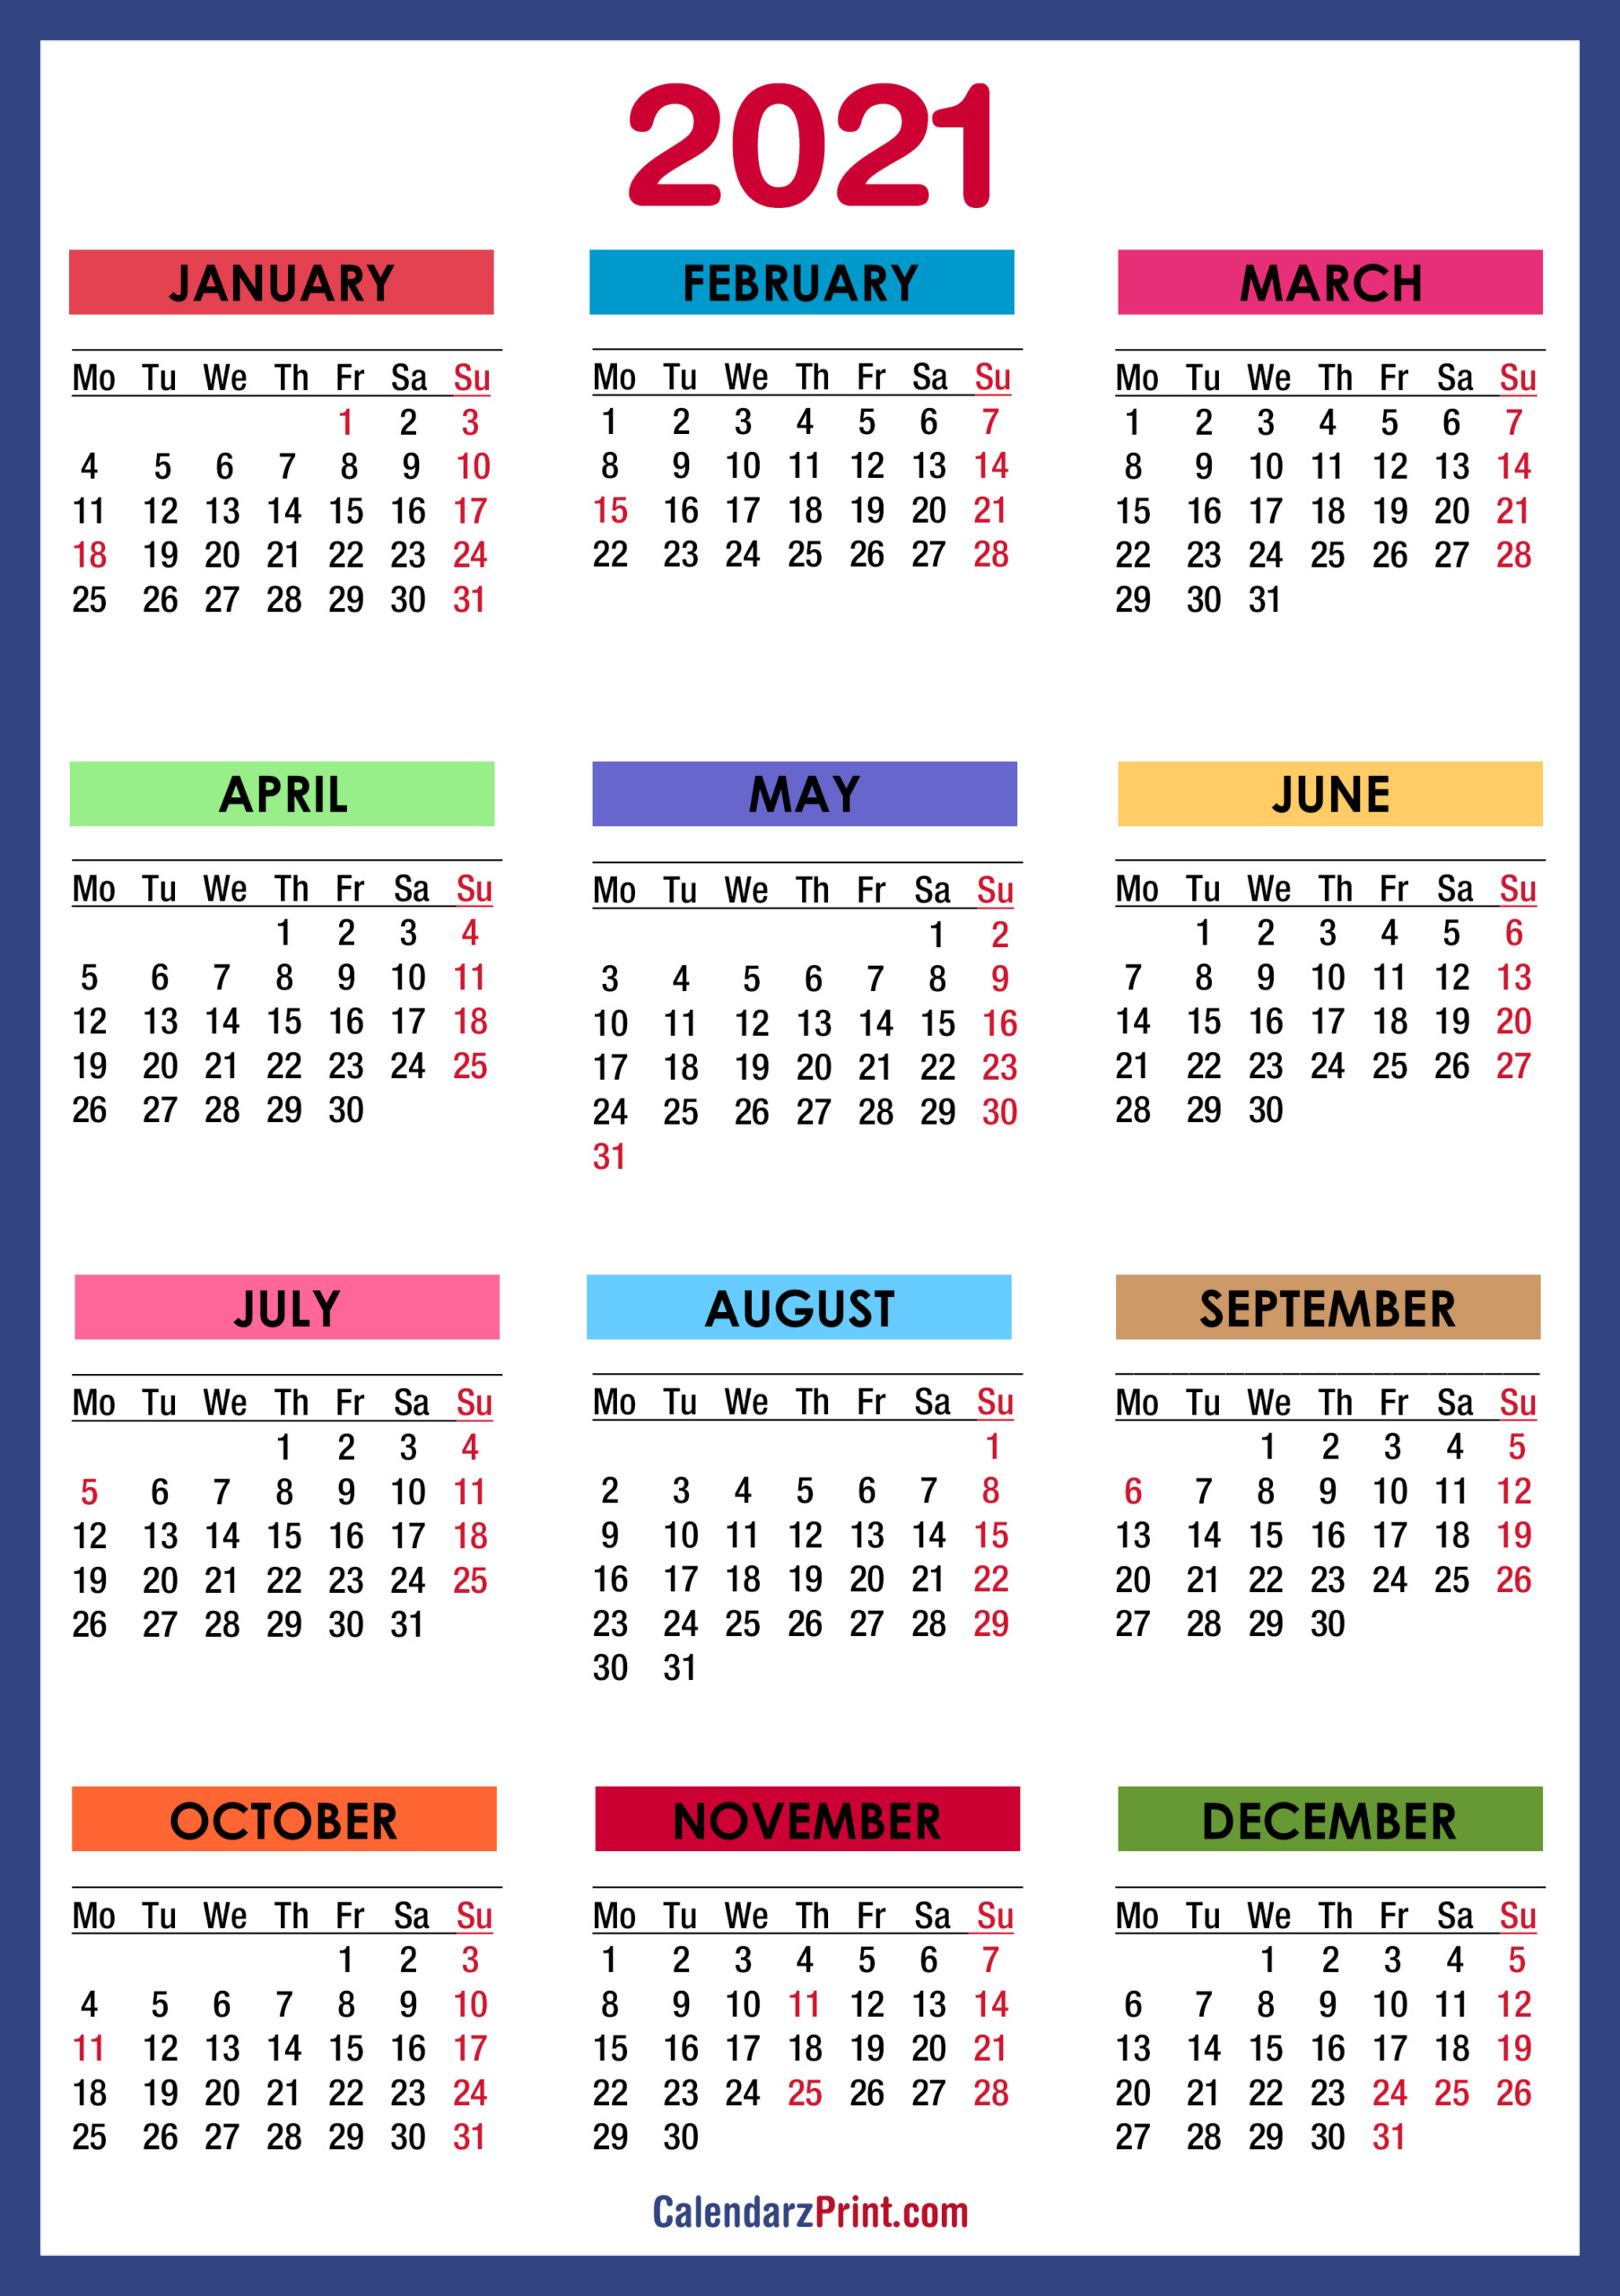 2021 Calendar With Us Holidays Printable Pdf | 2021 Printable Calendars